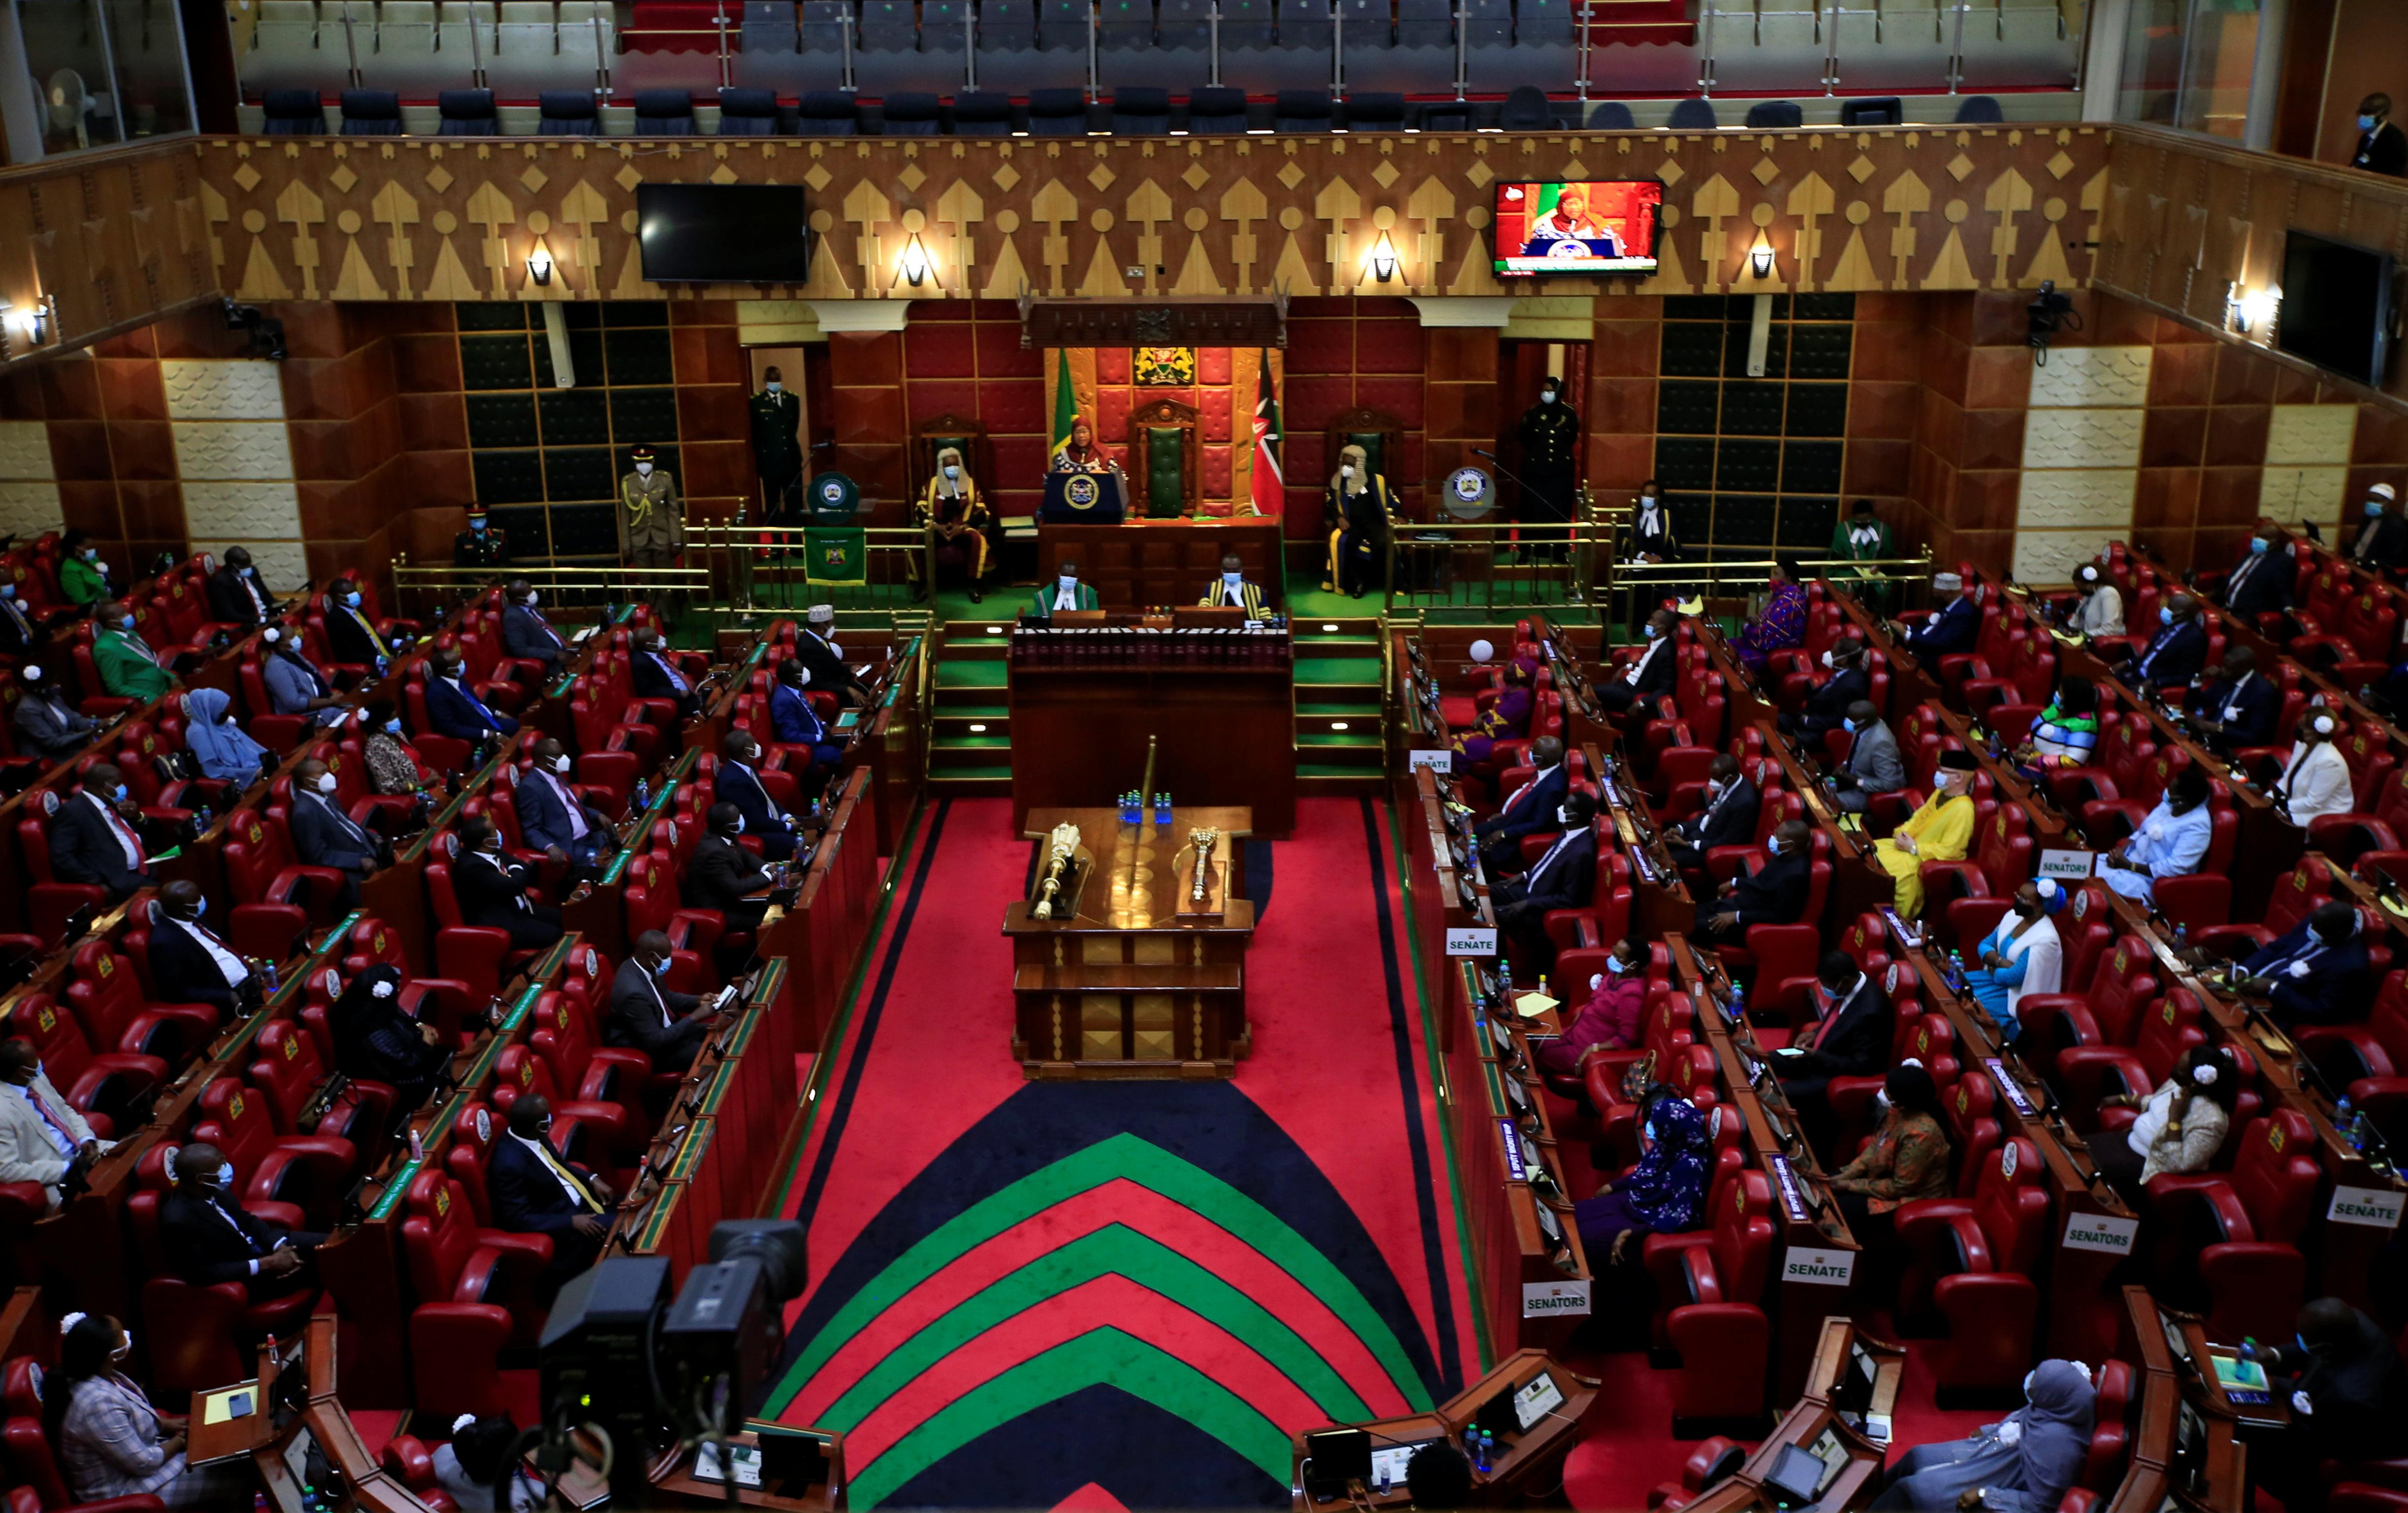 A general view shows Kenyan Members of Parliament and Senators attending an address by Tanzanian President Samia Suluhu Hassan inside the Parliament Buildings in Nairobi, Kenya, May 5, 2021. REUTERS/Monicah Mwangi